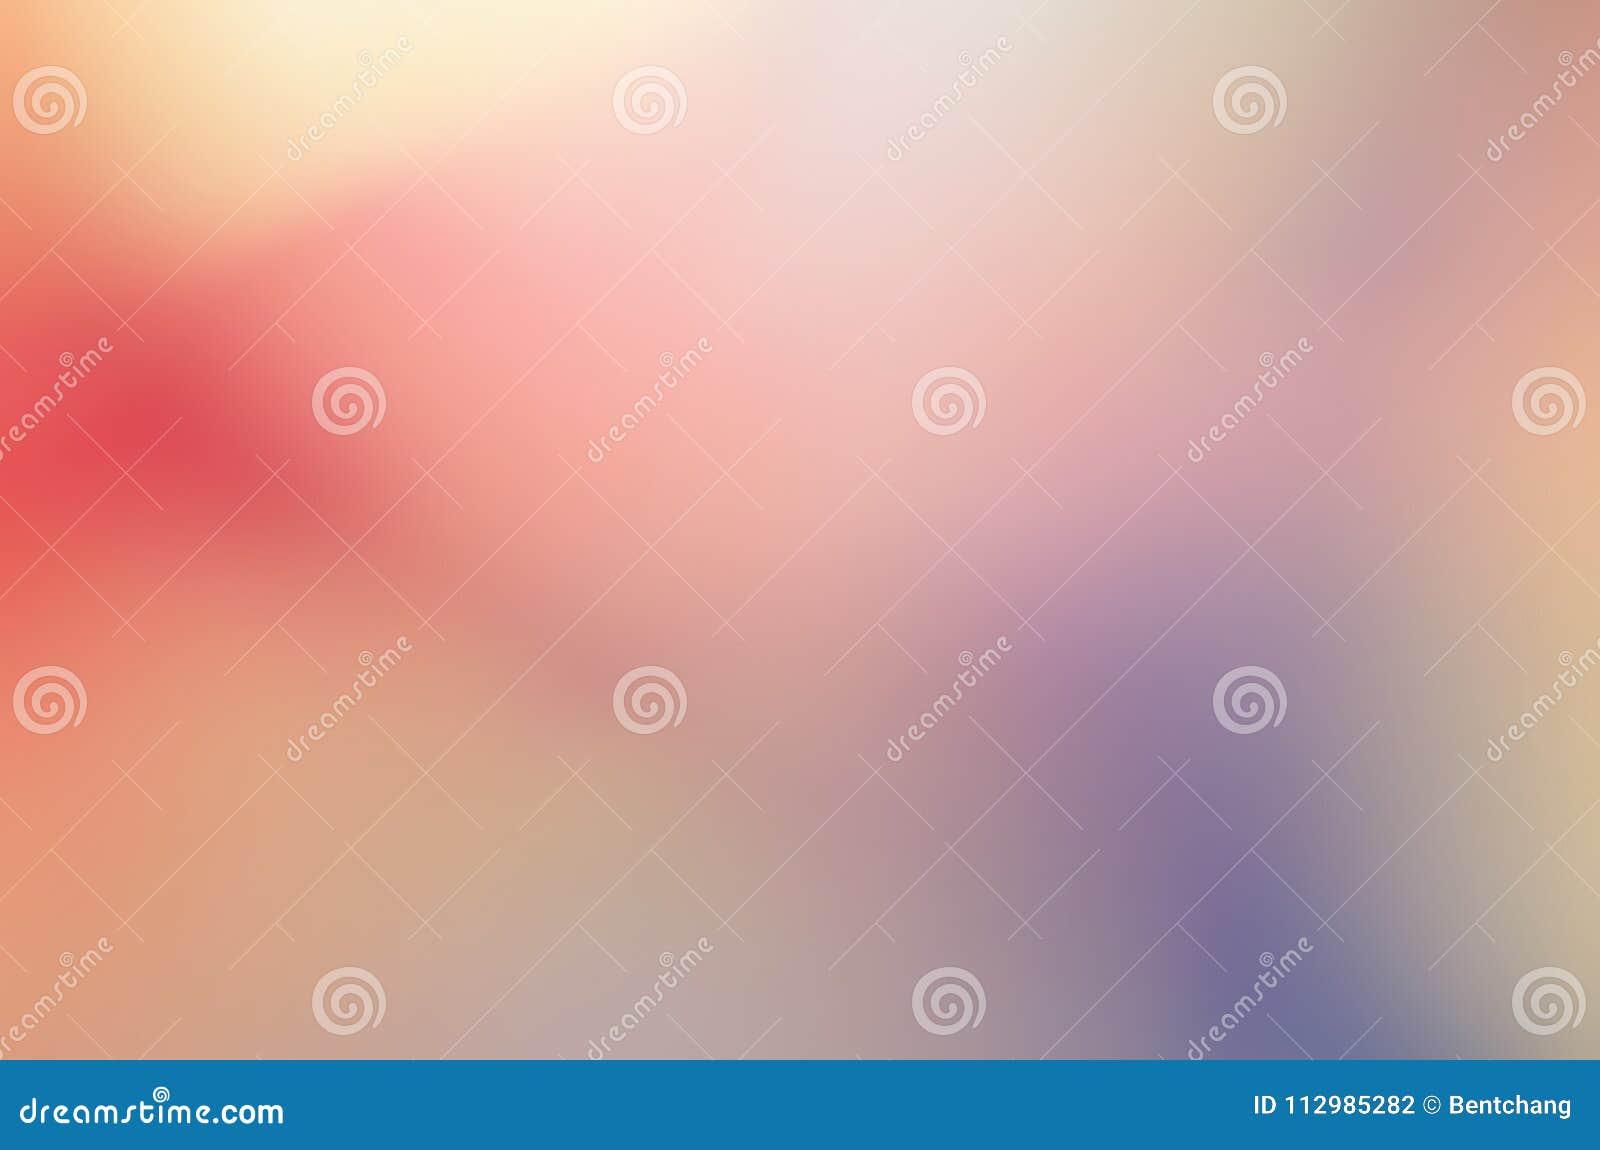 Background or backdrop, motion blur, good for design texture. Light, dream, painting & artwork.